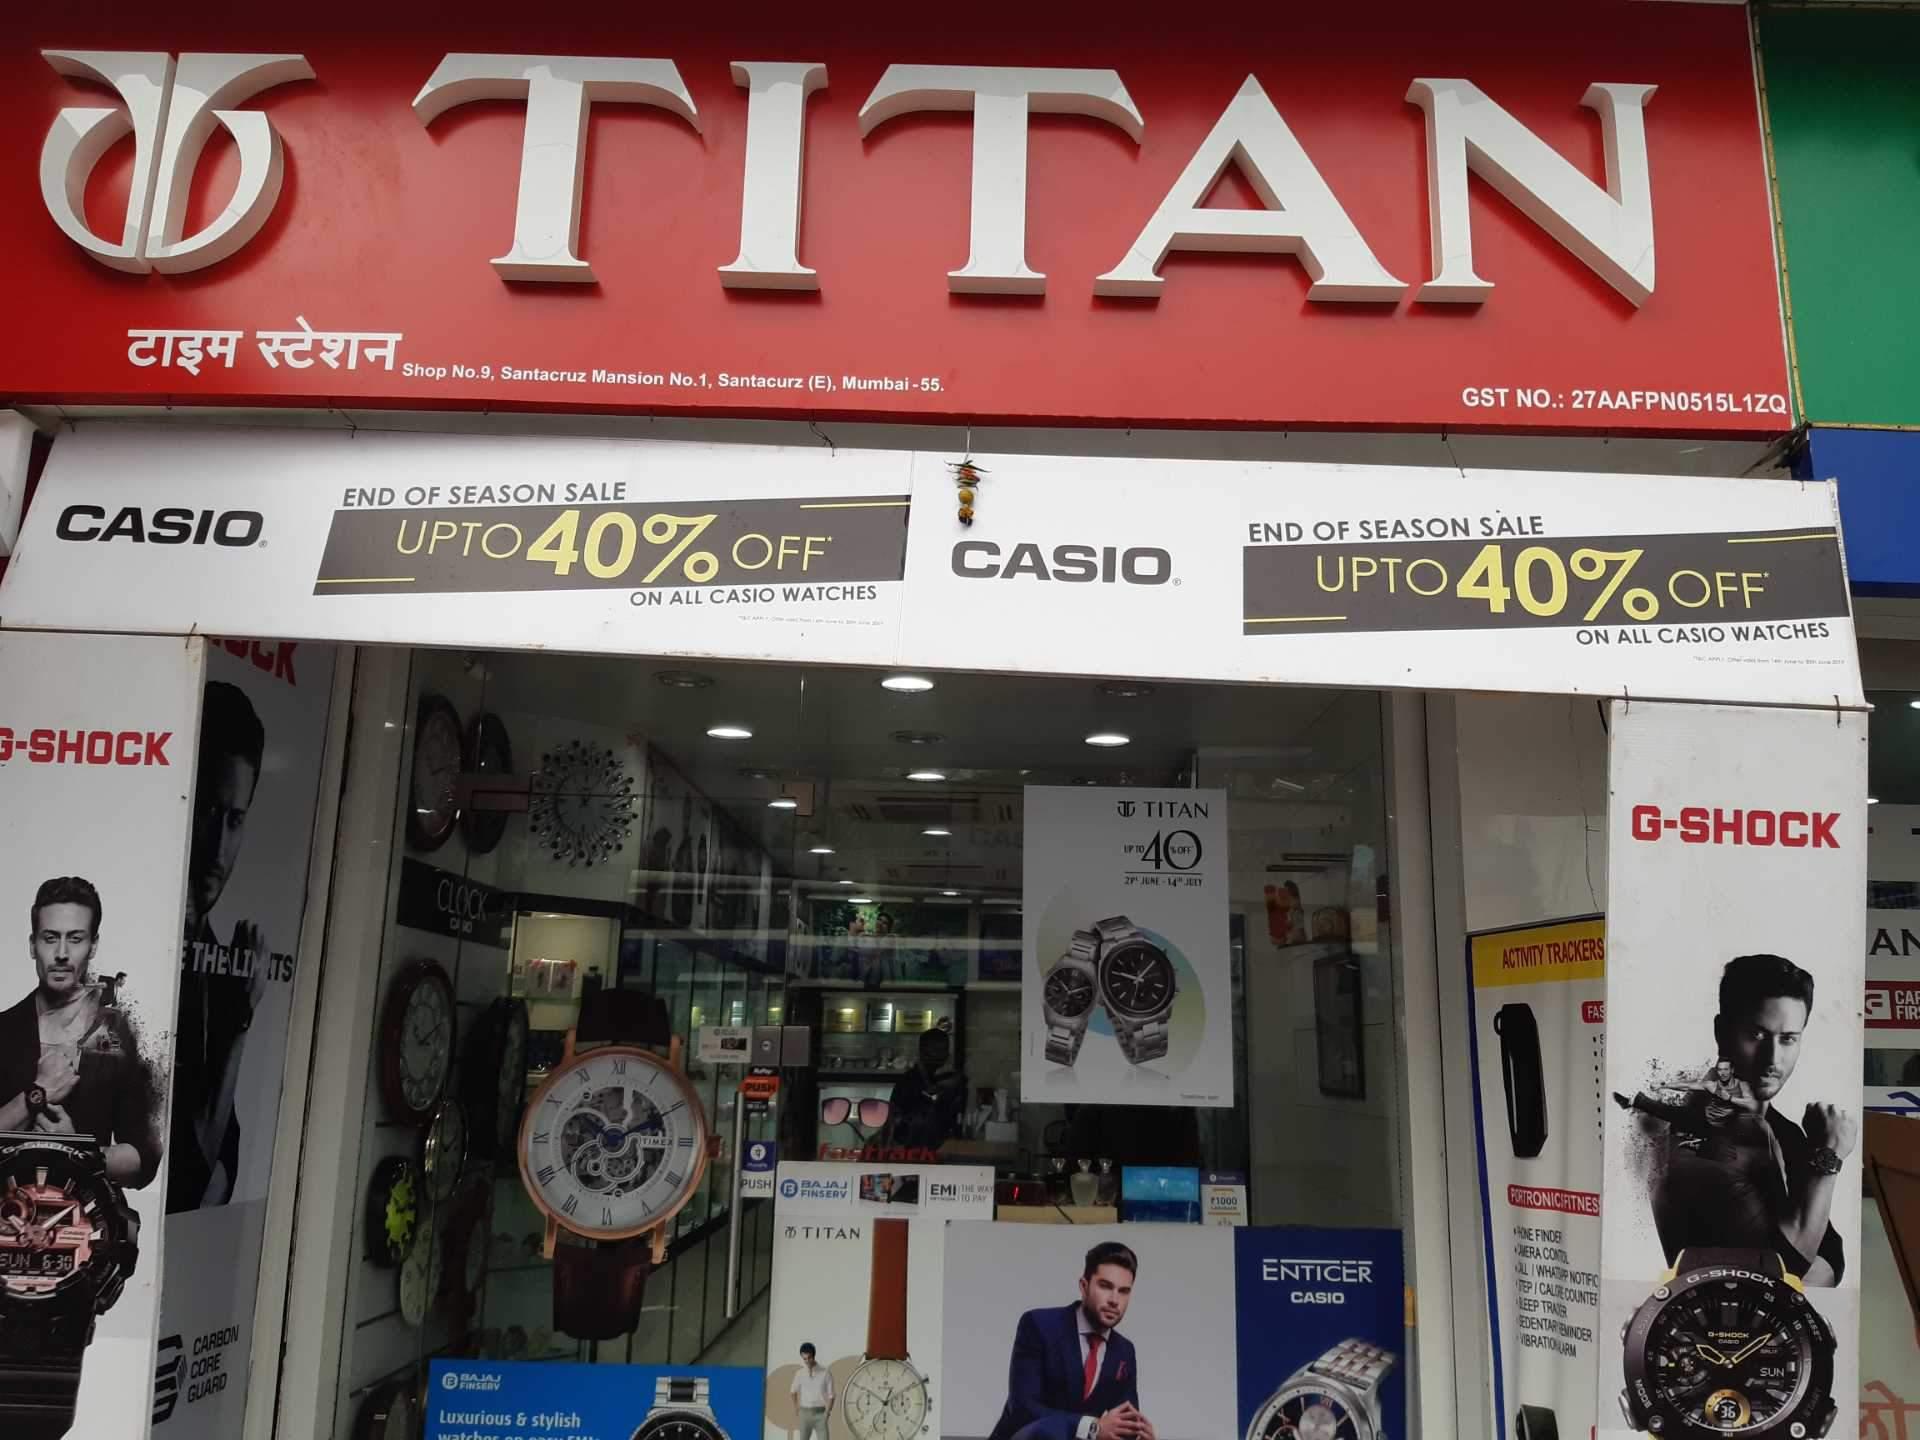 Top Men Sports Wrist Watch Wholesalers in Girgaon, Mumbai